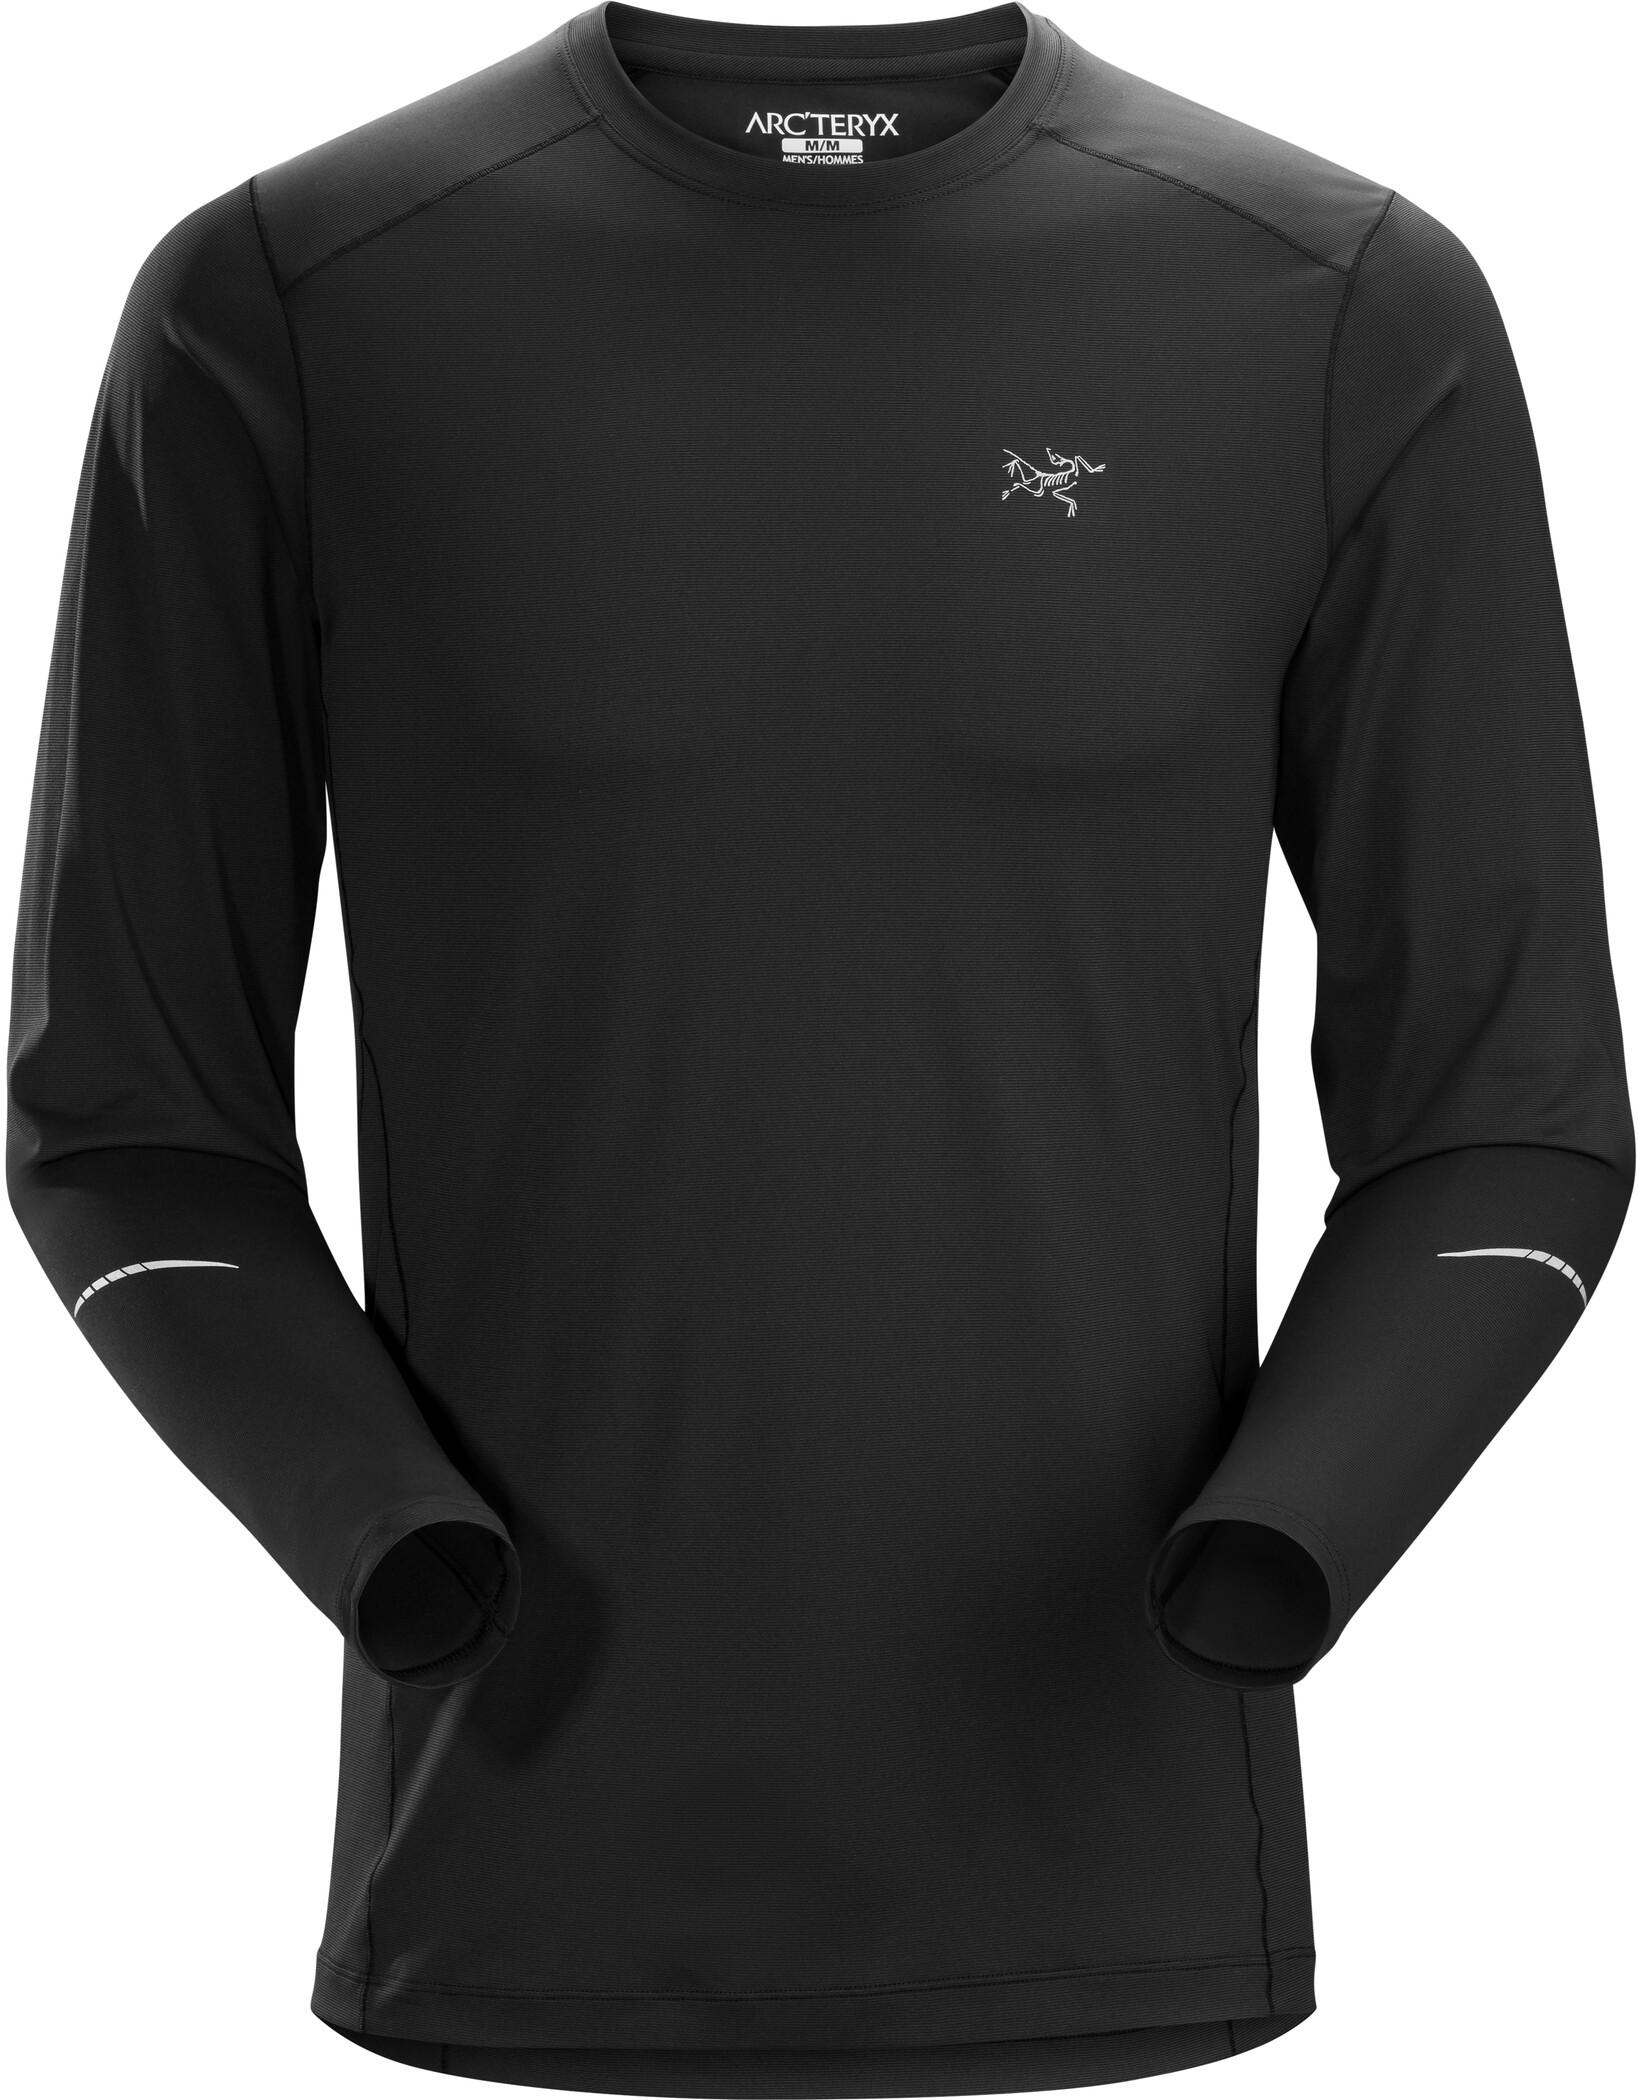 Arc'teryx Motus Langærmet T-shirt Herrer, black (2019)   Jerseys